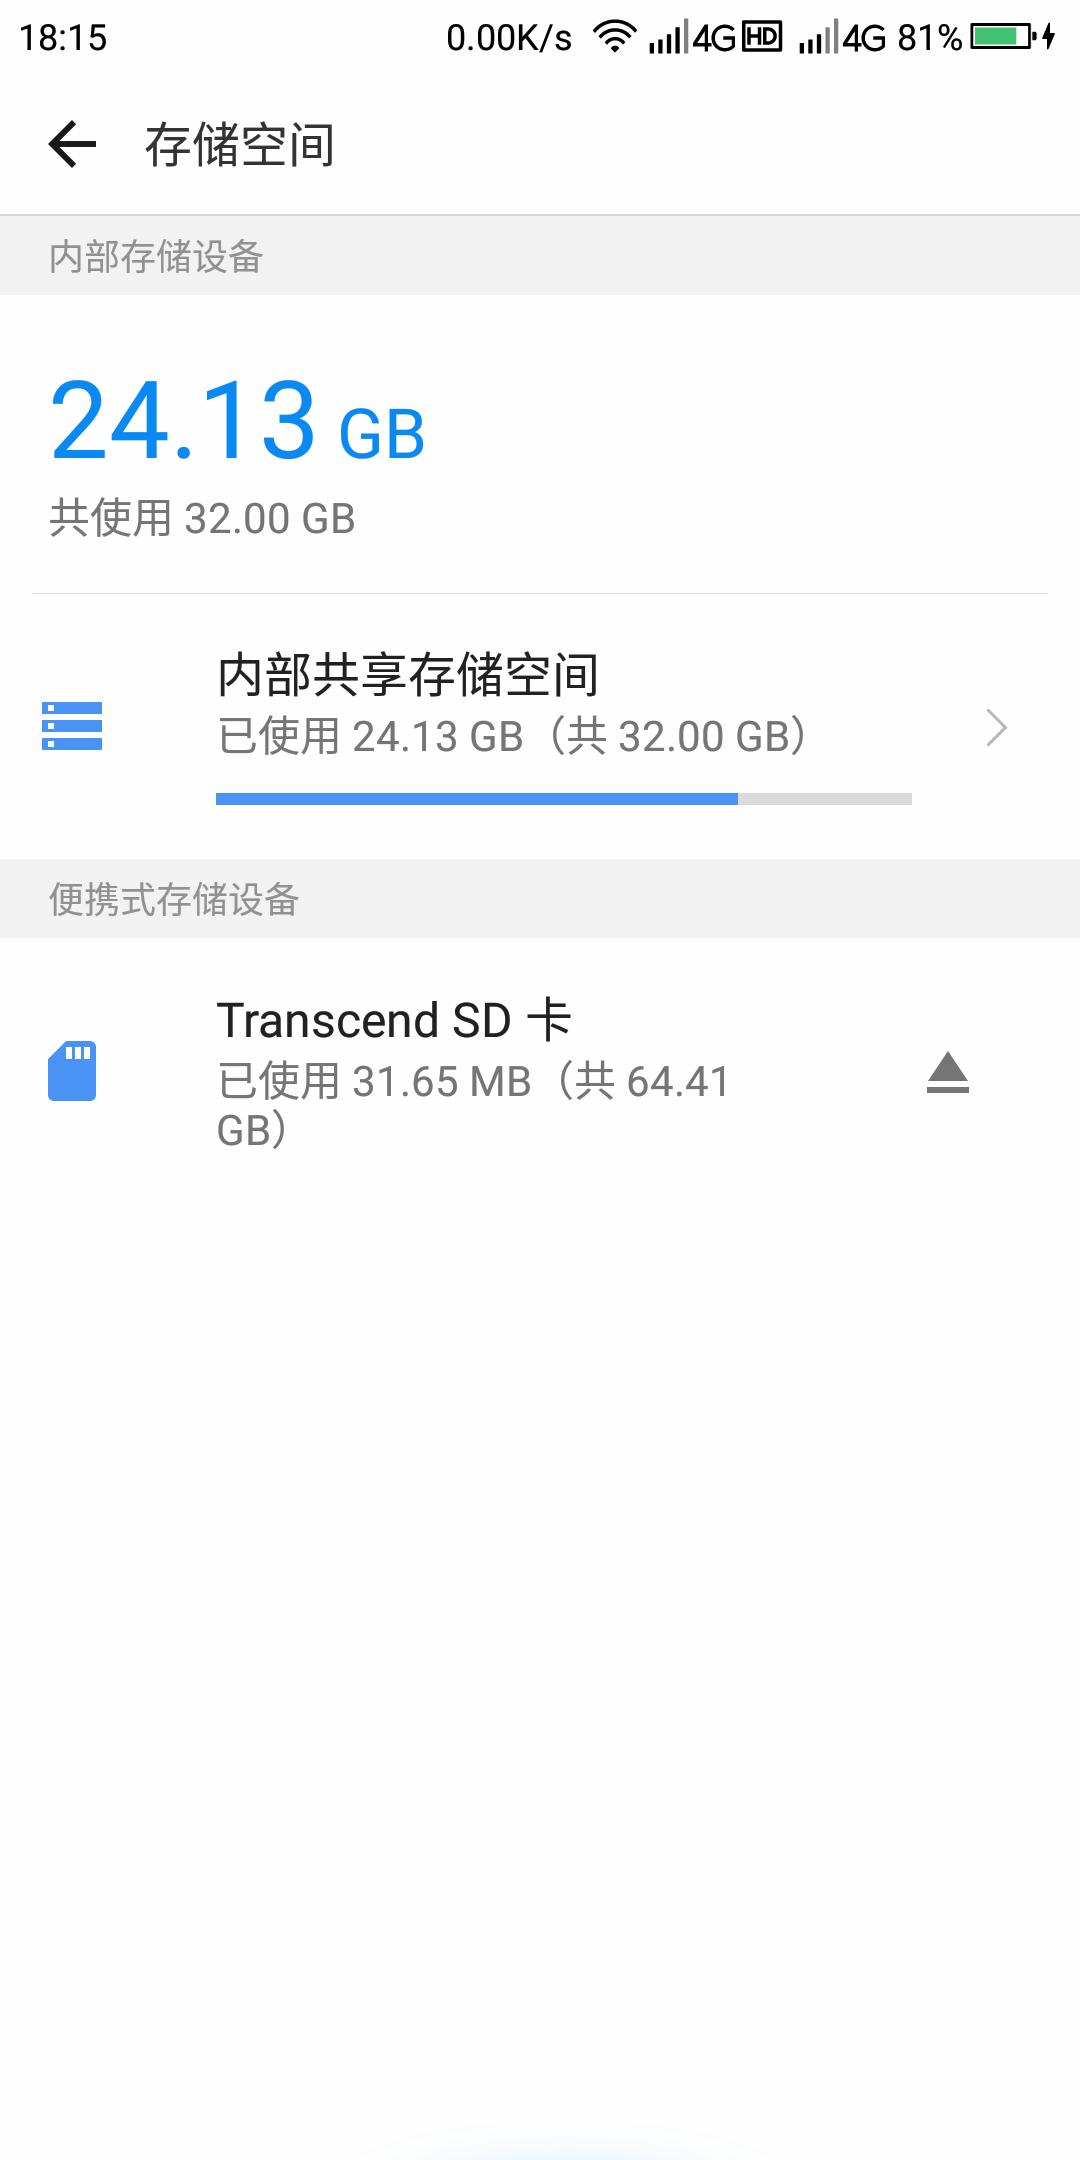 Screenshot_2018-11-02-18-15-36.png